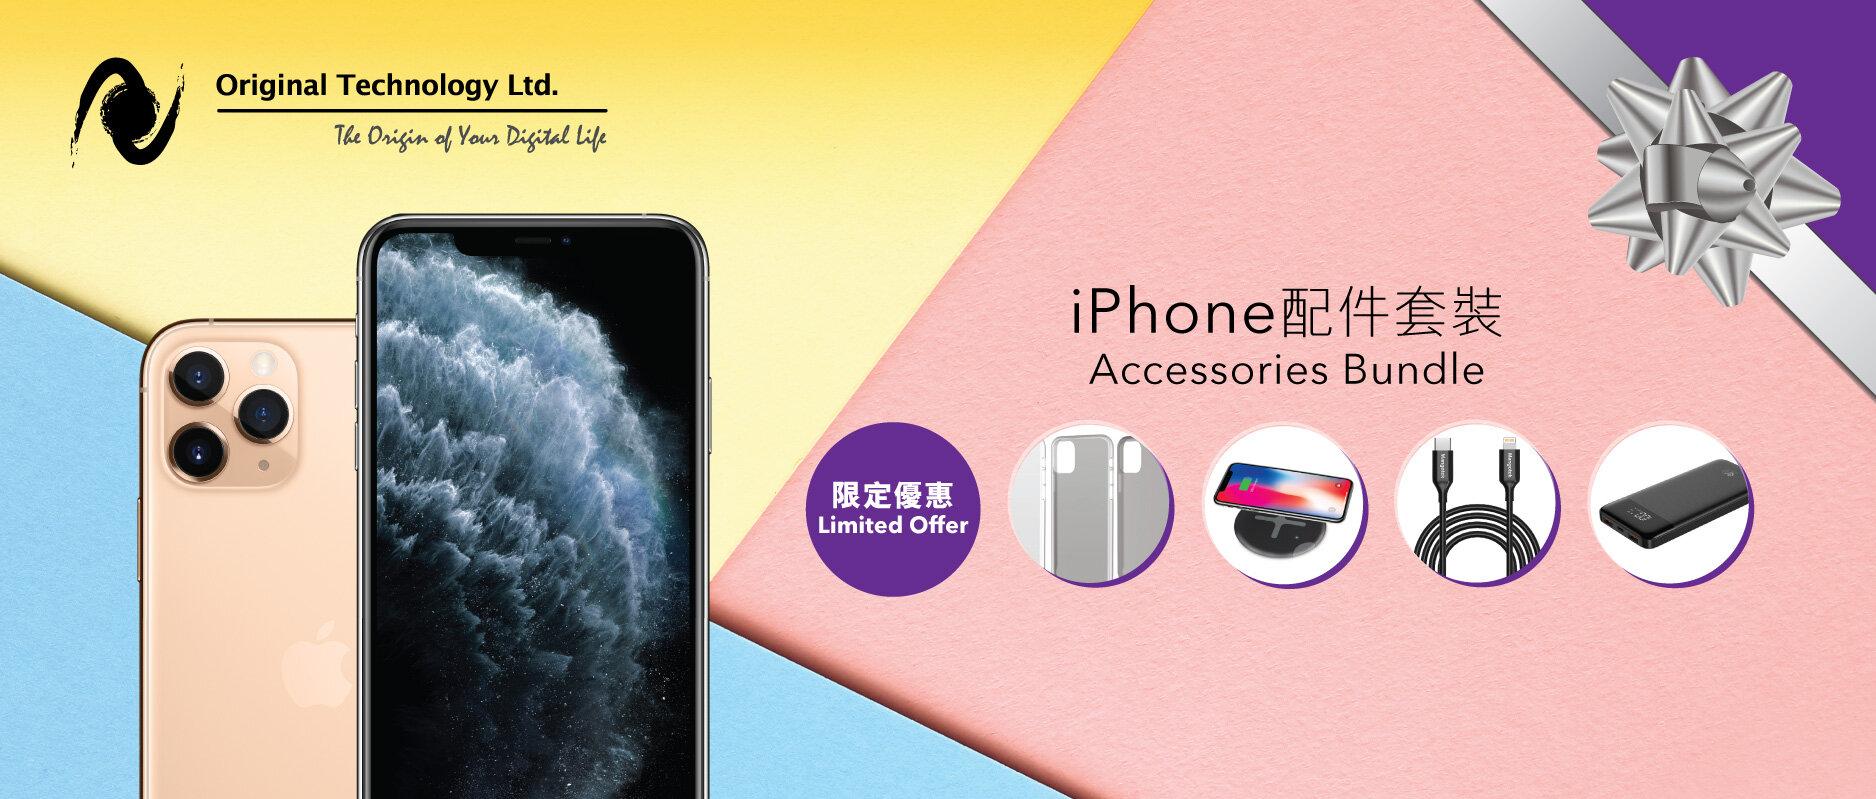 iPhone 11 配件套裝限定優惠|Accessories Bundle Offer